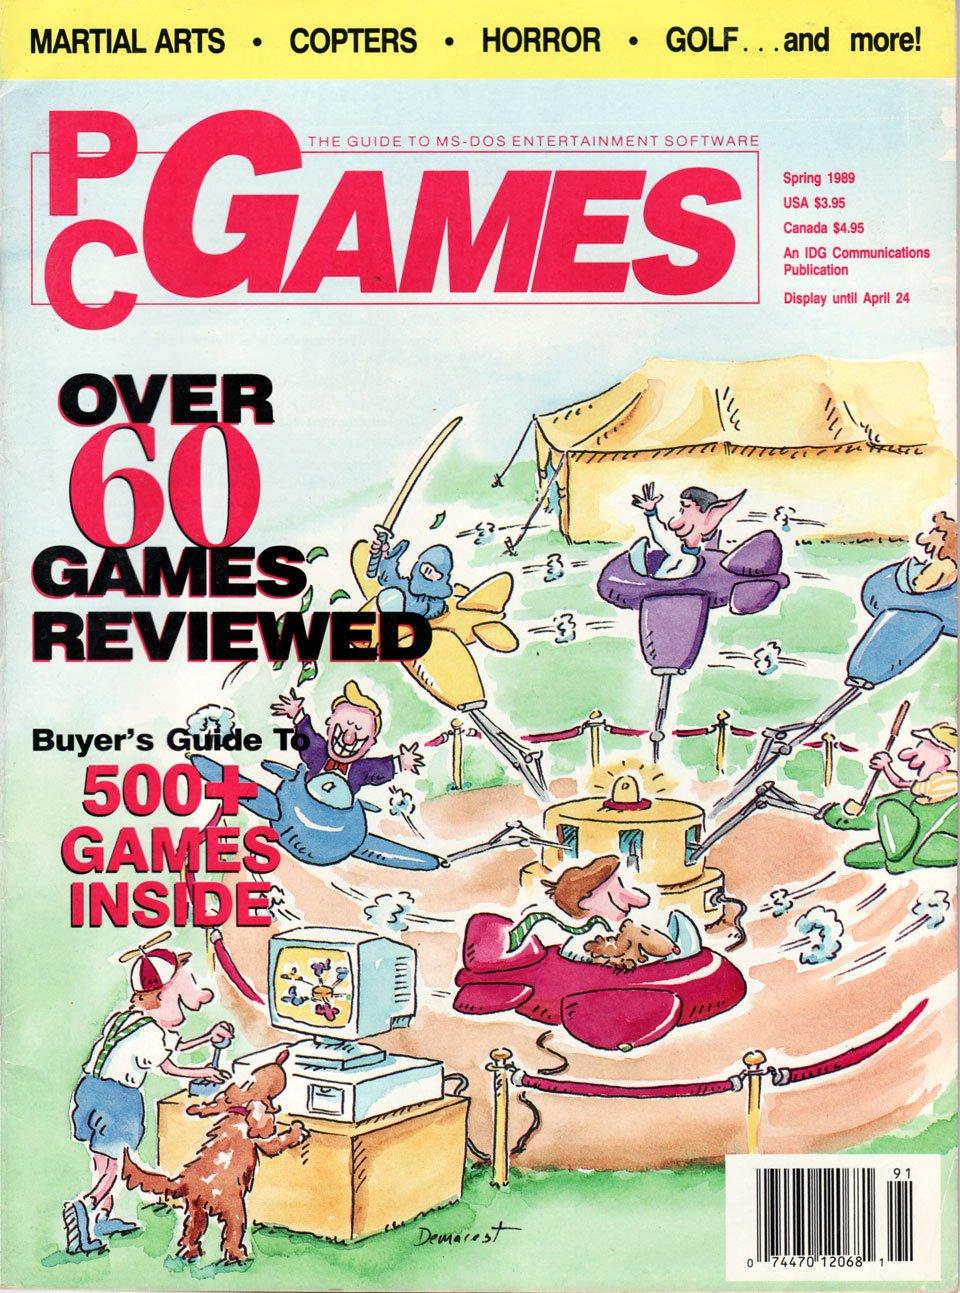 PCGames (1989 Spring)